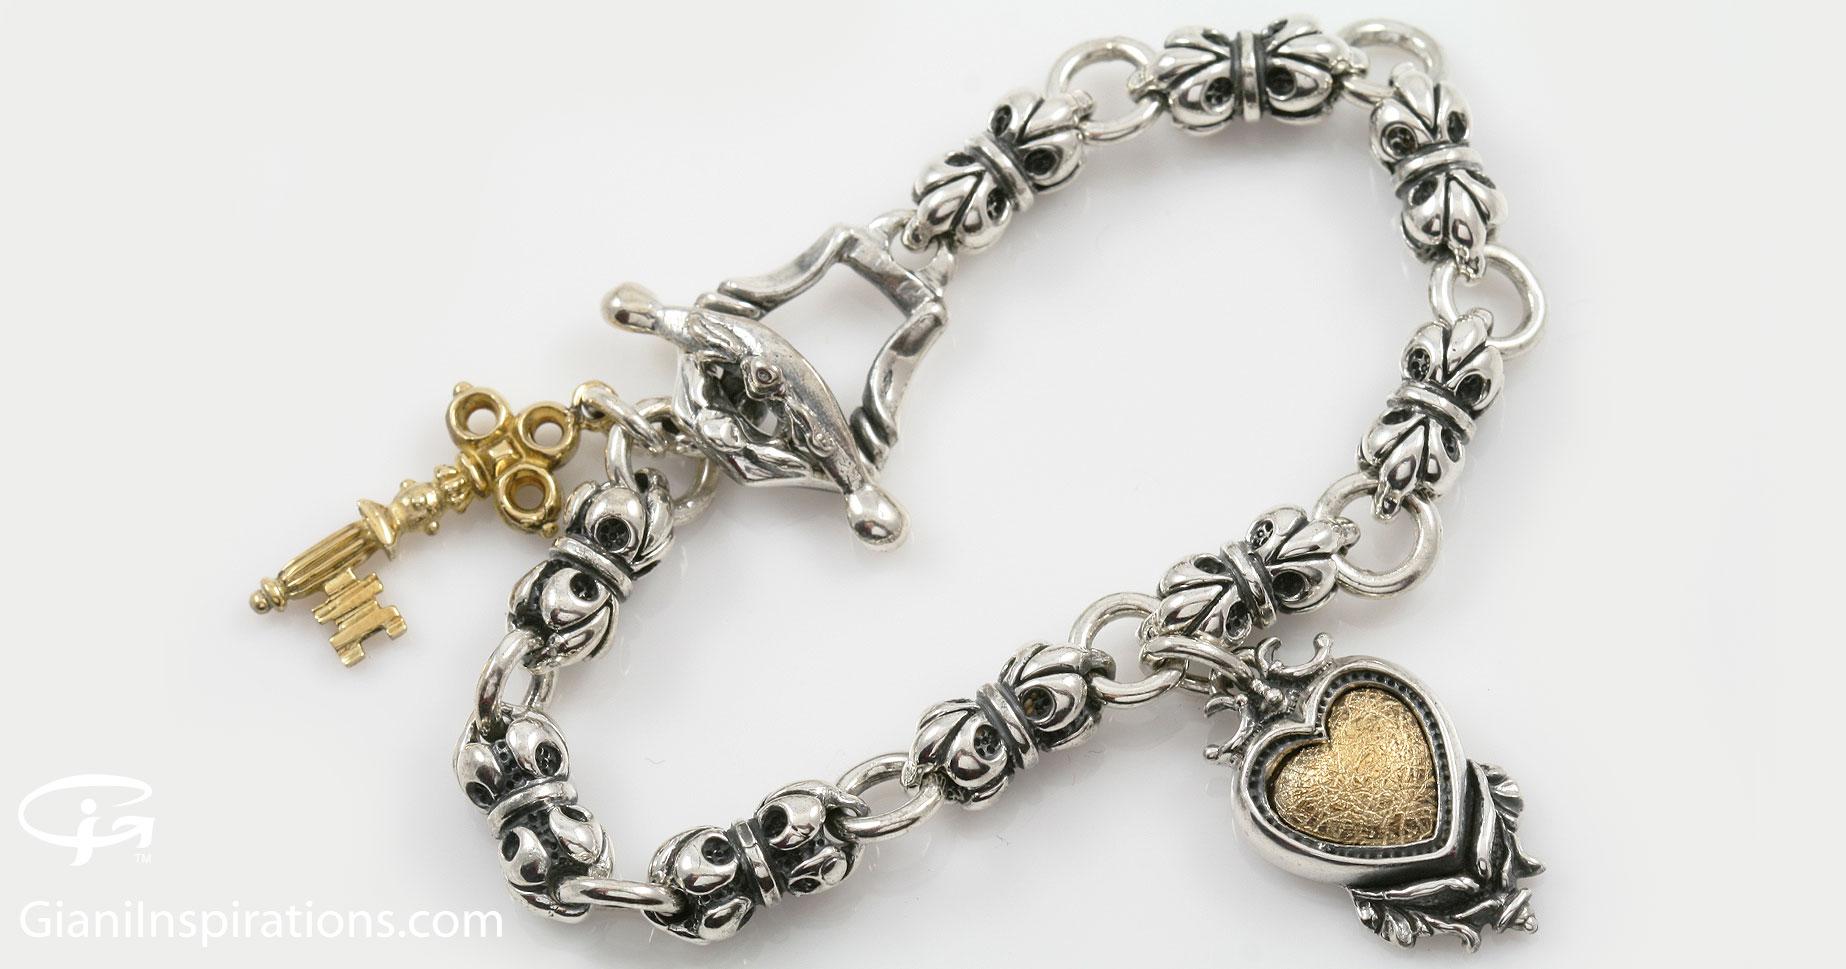 giani inspirations fleur de lis chain key charm